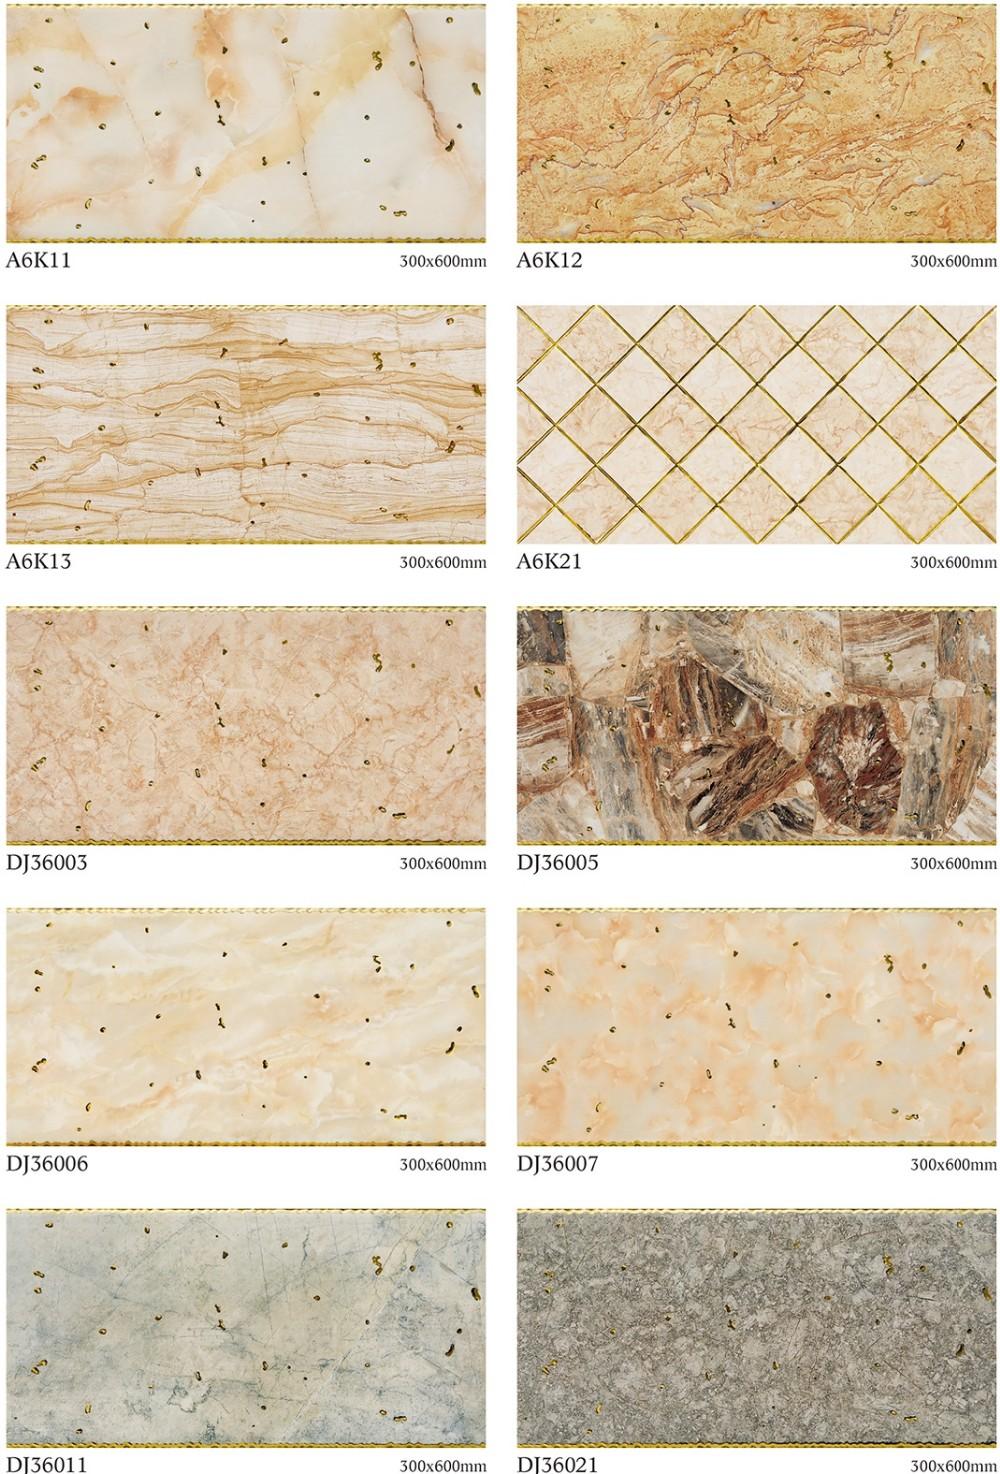 China foshan ceramic tile inkjet mould marble look bathroom wall china foshan ceramic tile inkjet mould marble look bathroom wall tiles 300x600 dailygadgetfo Images